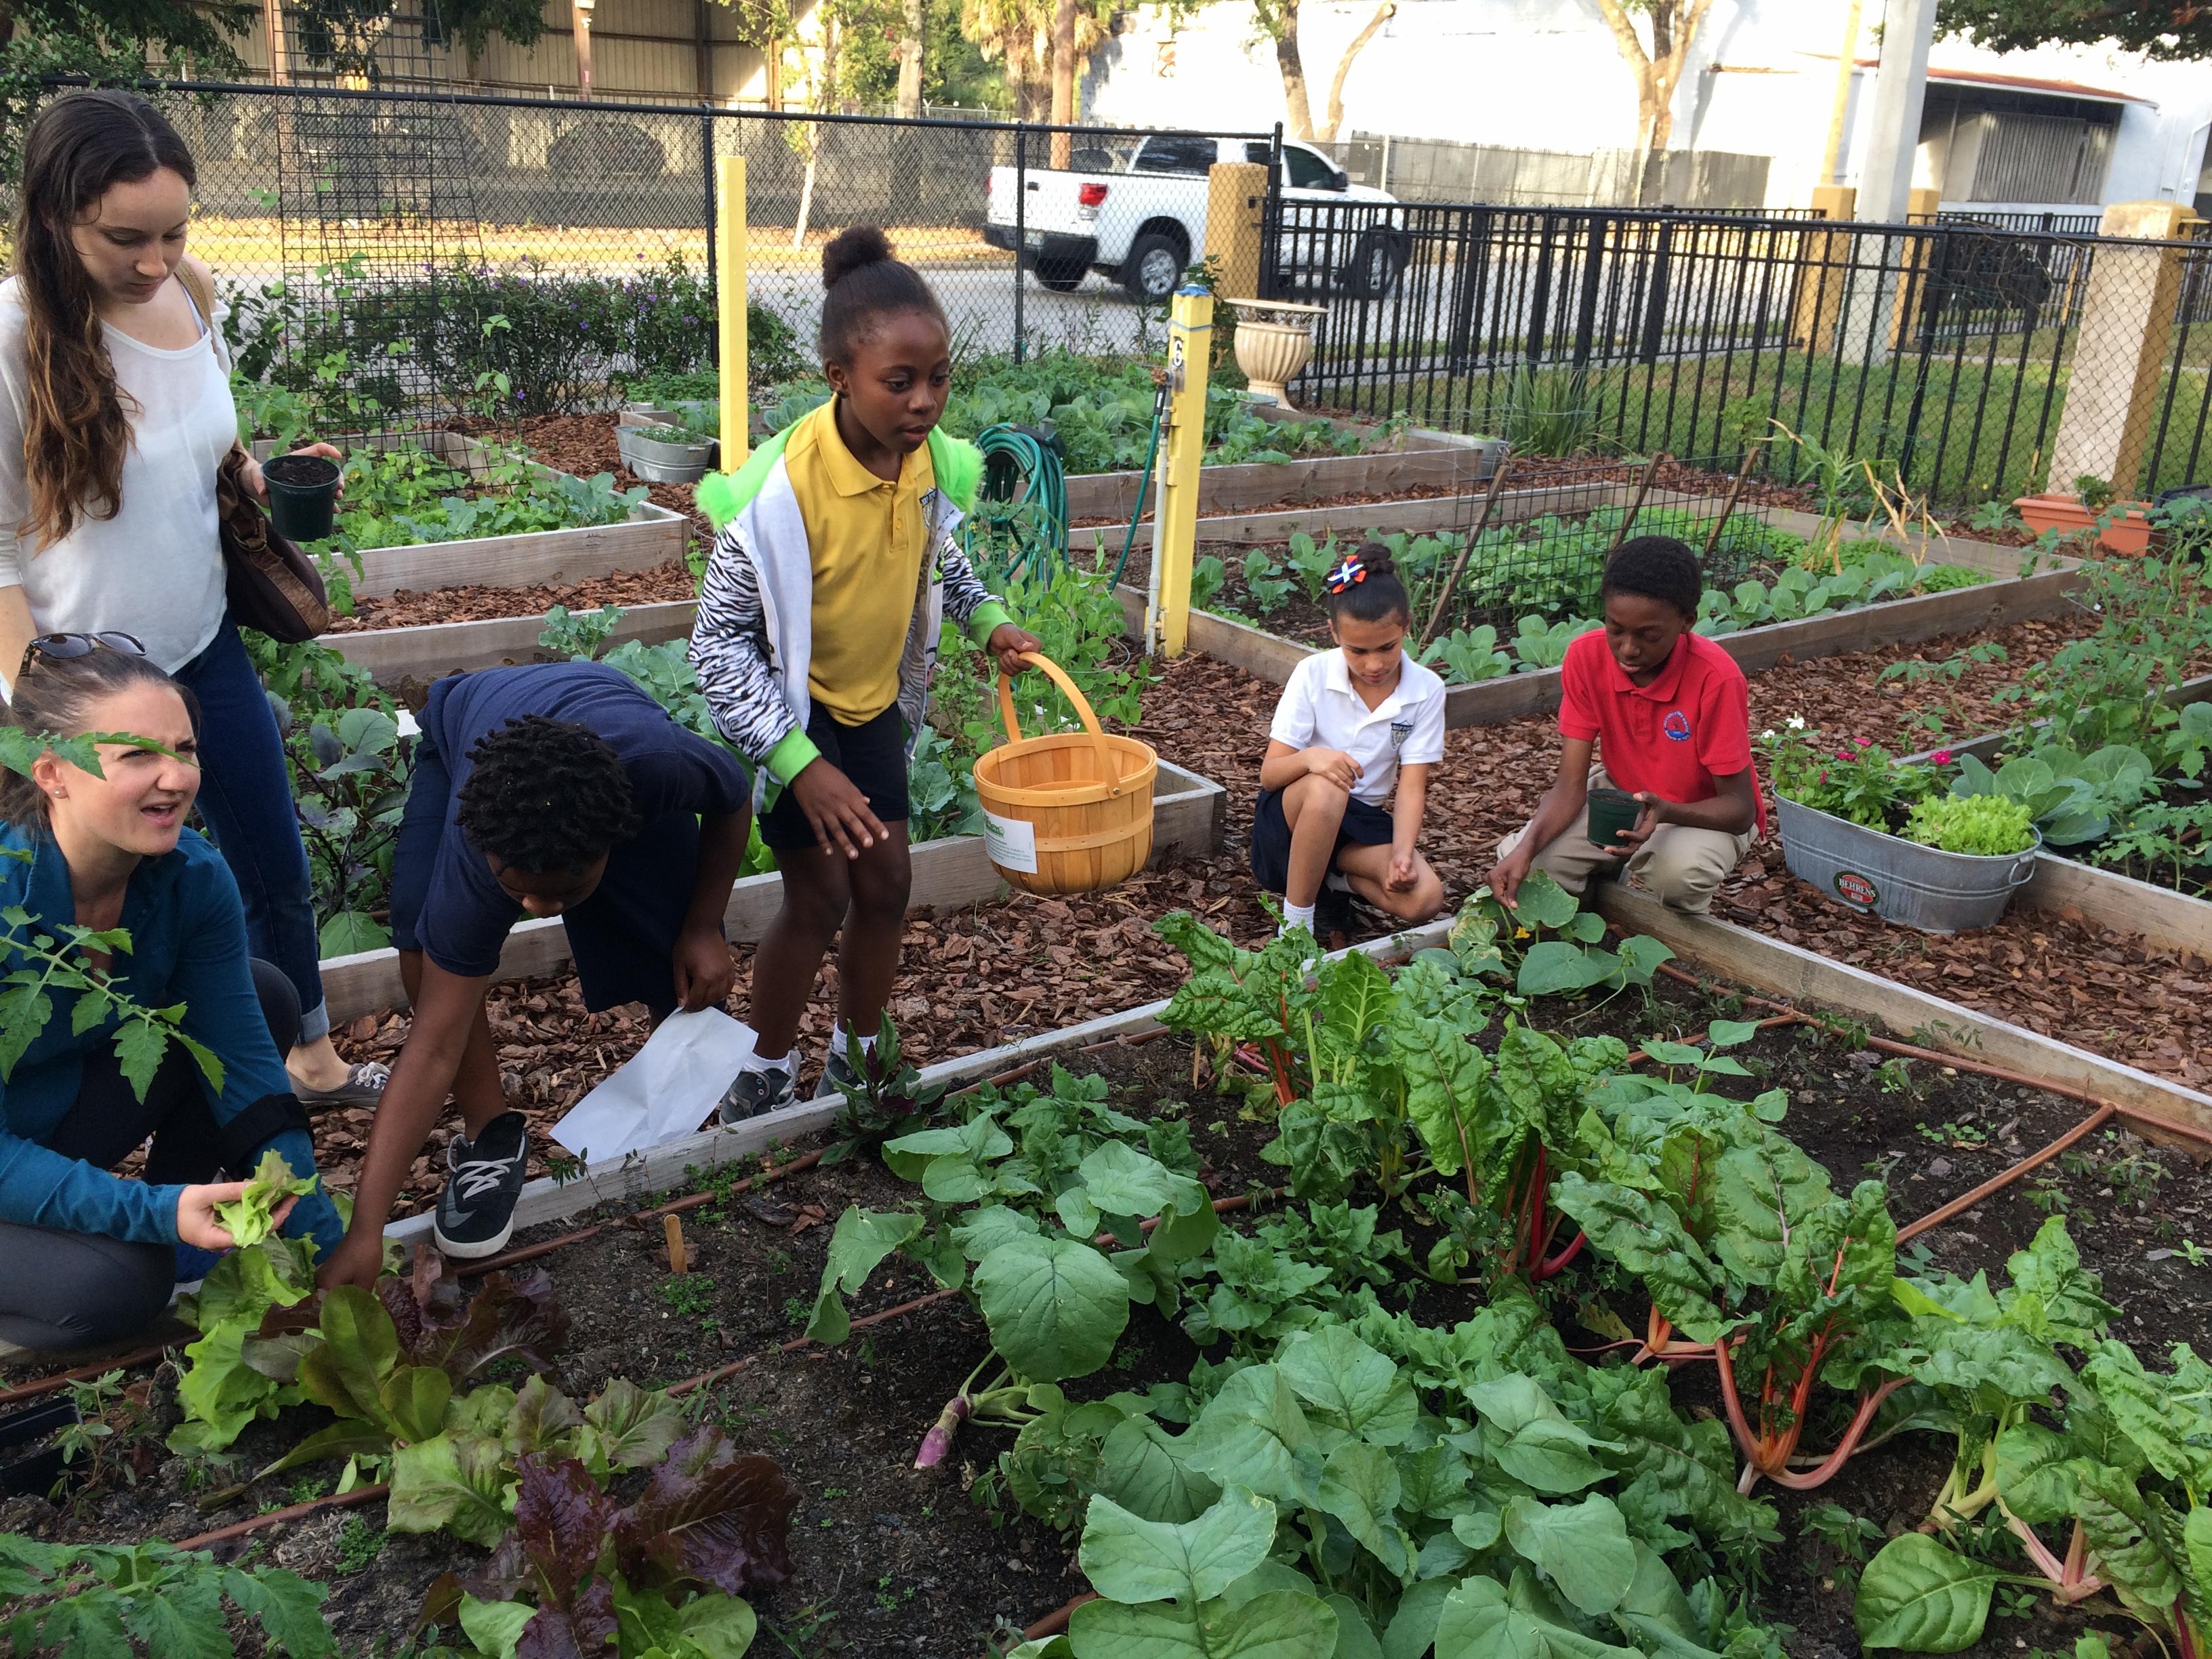 DIY Backyard Gardening Ideas for Kids   Miss Smarty Plants